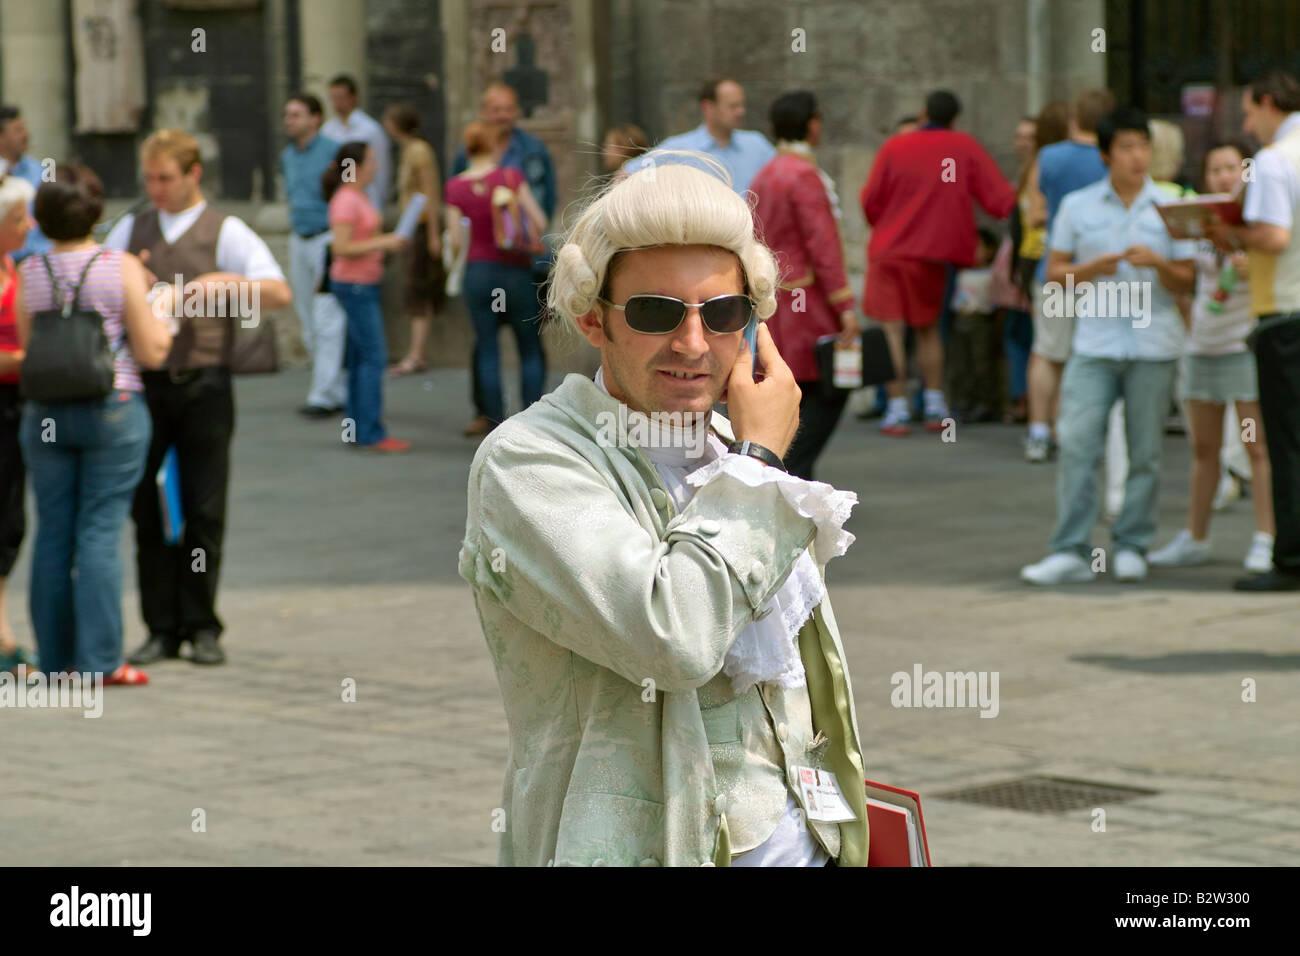 18th Century man on mobile phone - Stock Image